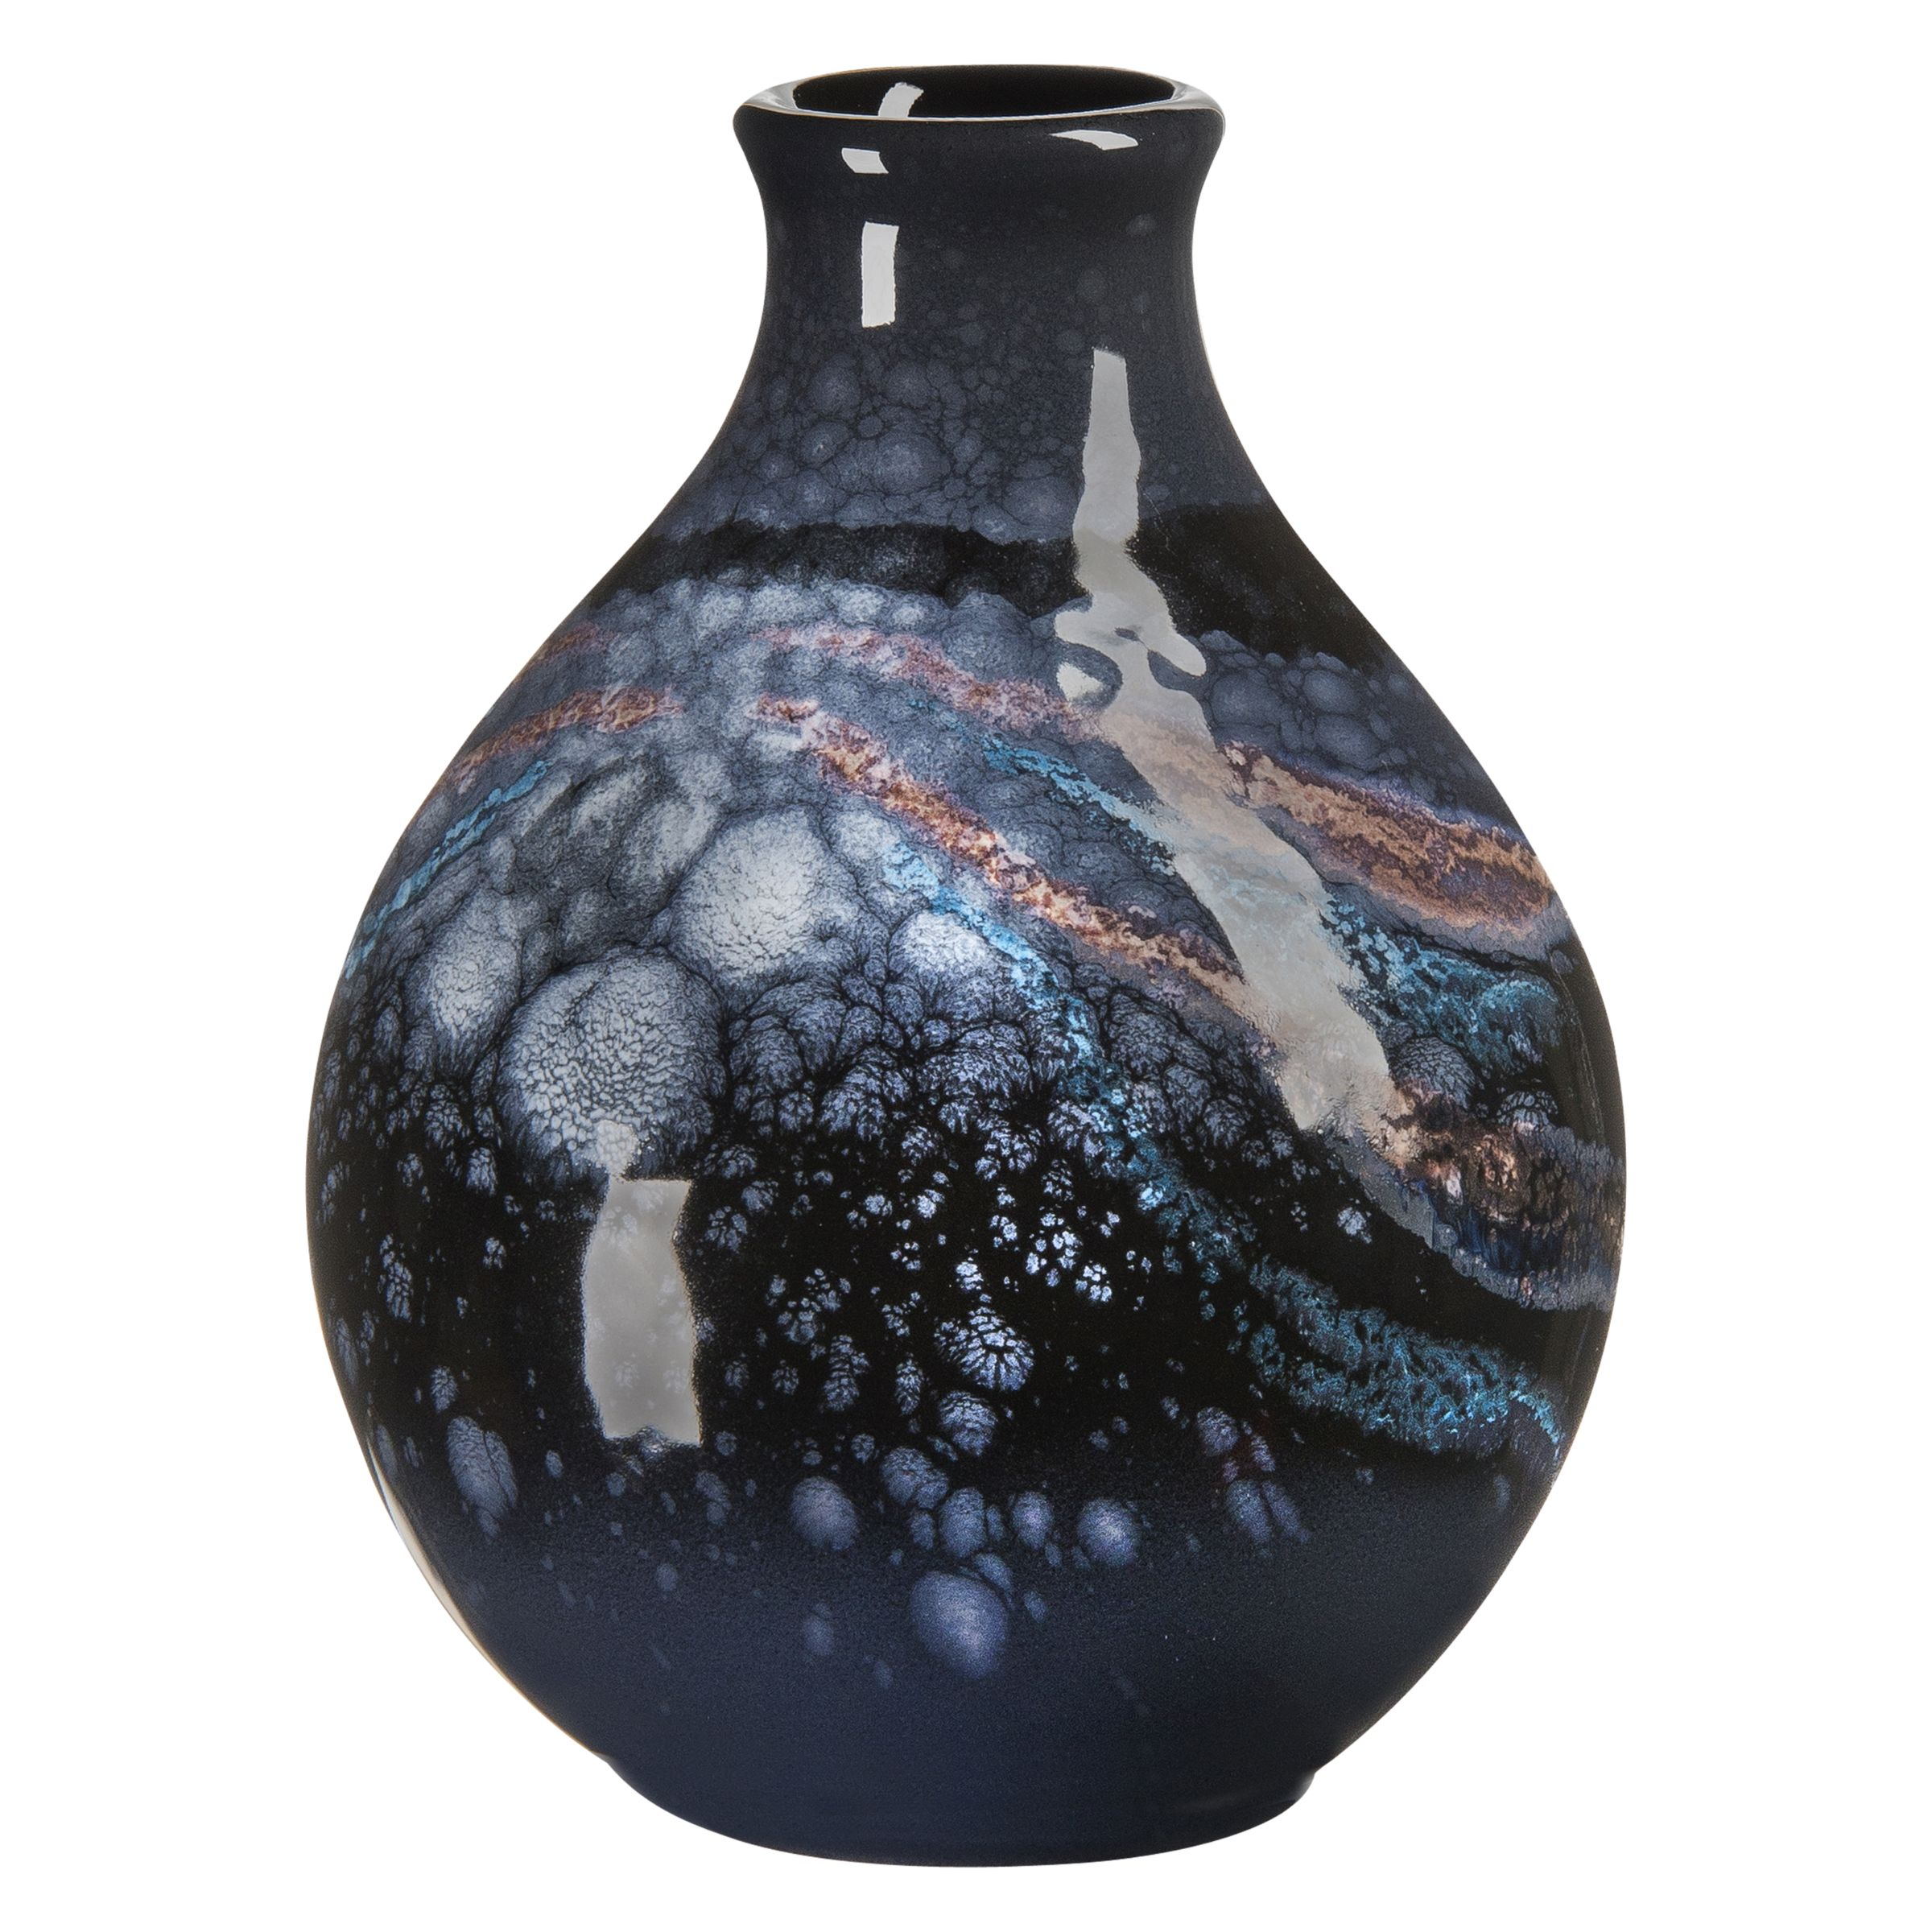 Poole Pottery Poole Pottery Celestial Bud Vase, Grey/ Blue